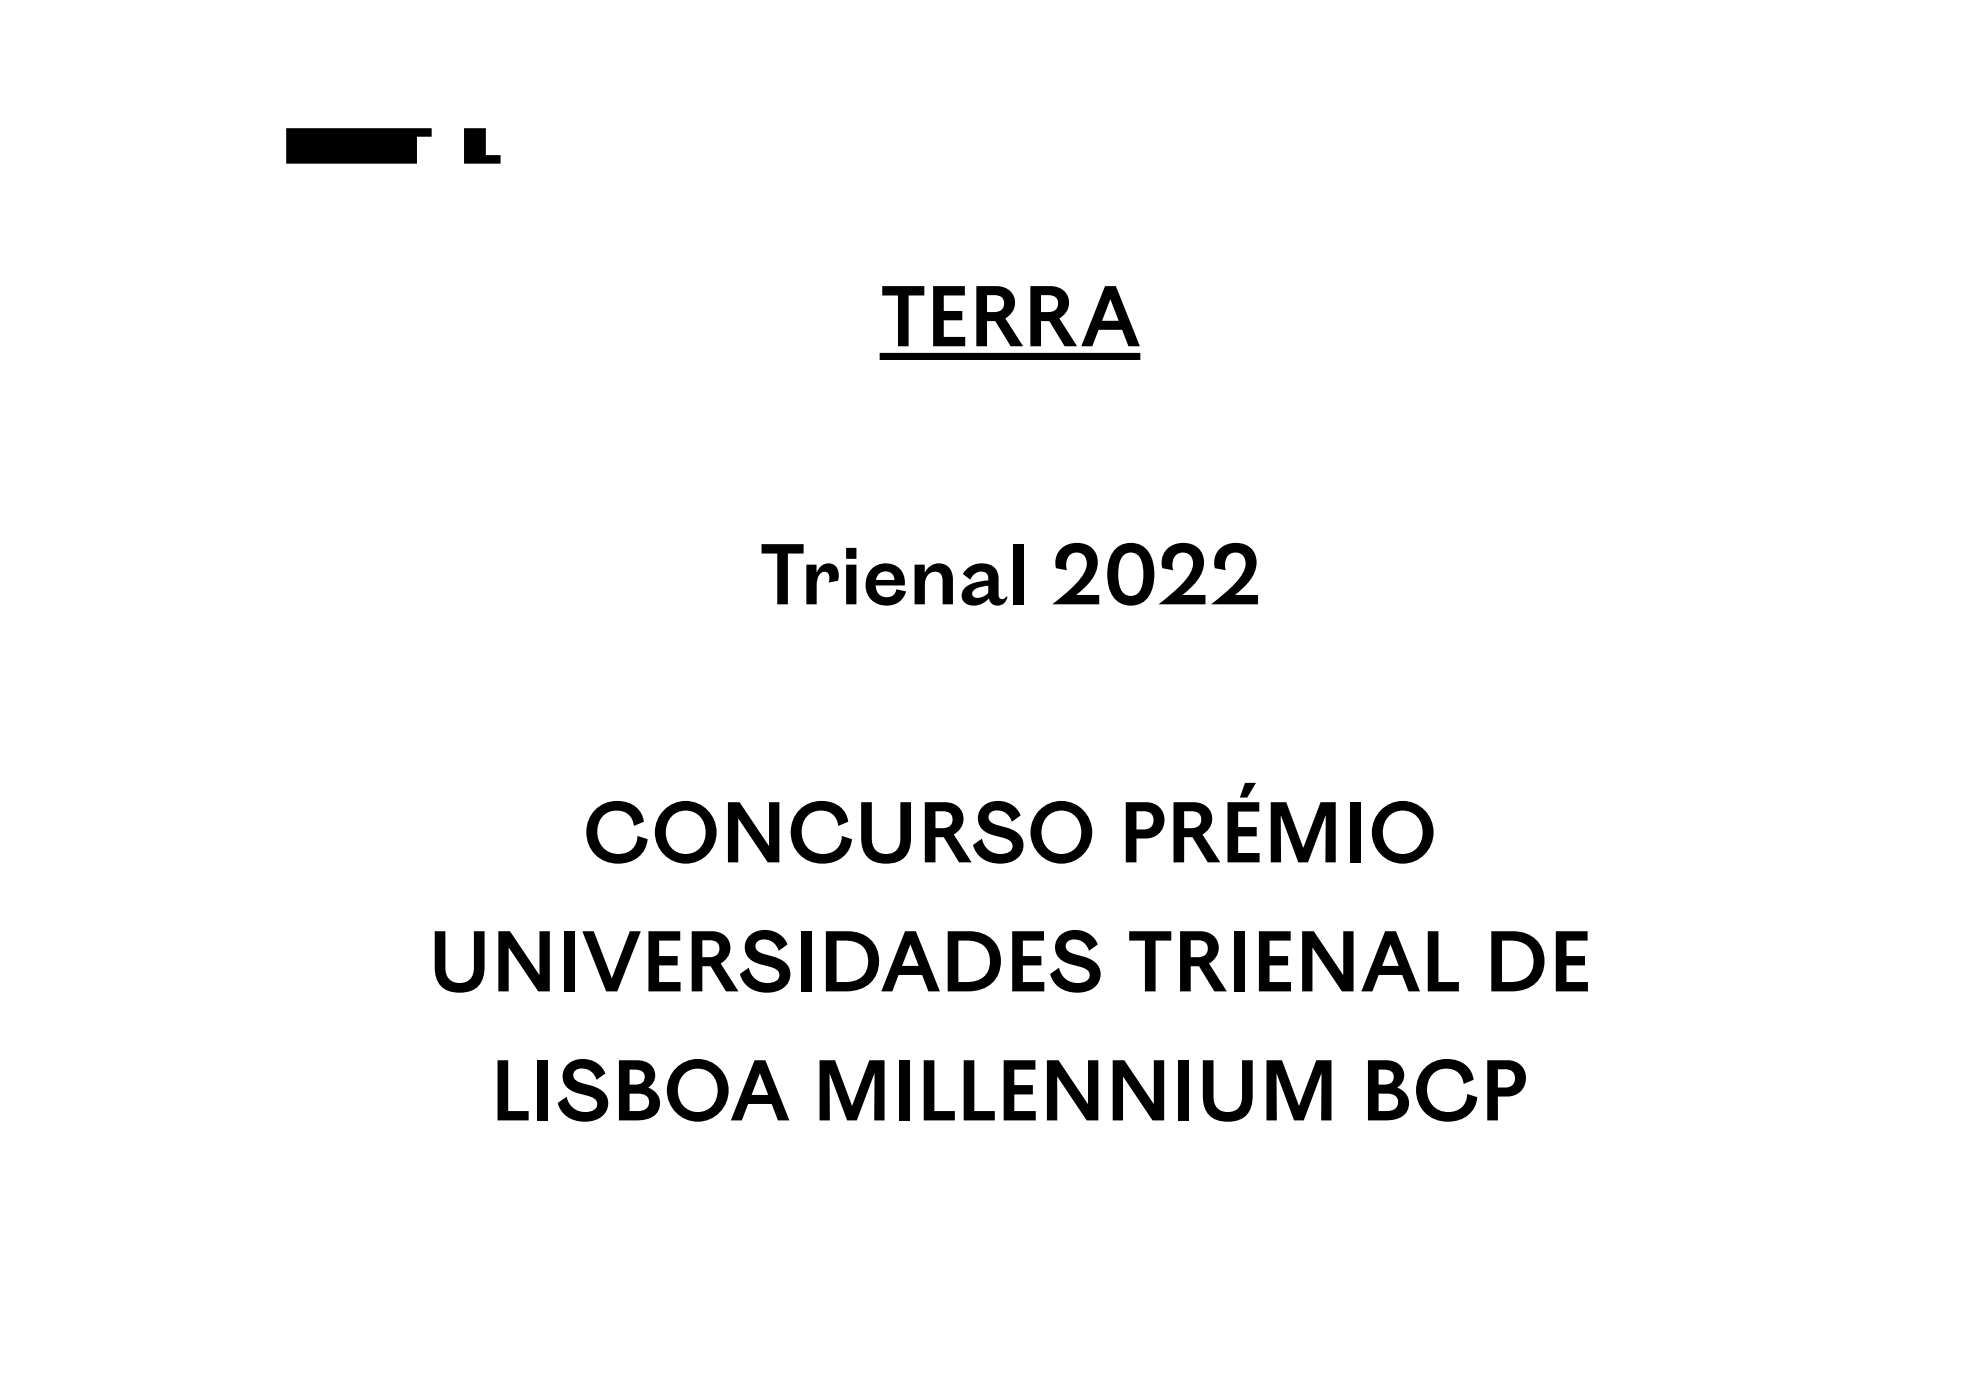 Concurso Prémio Universidades Trienal de Lisboa Millennium bcp